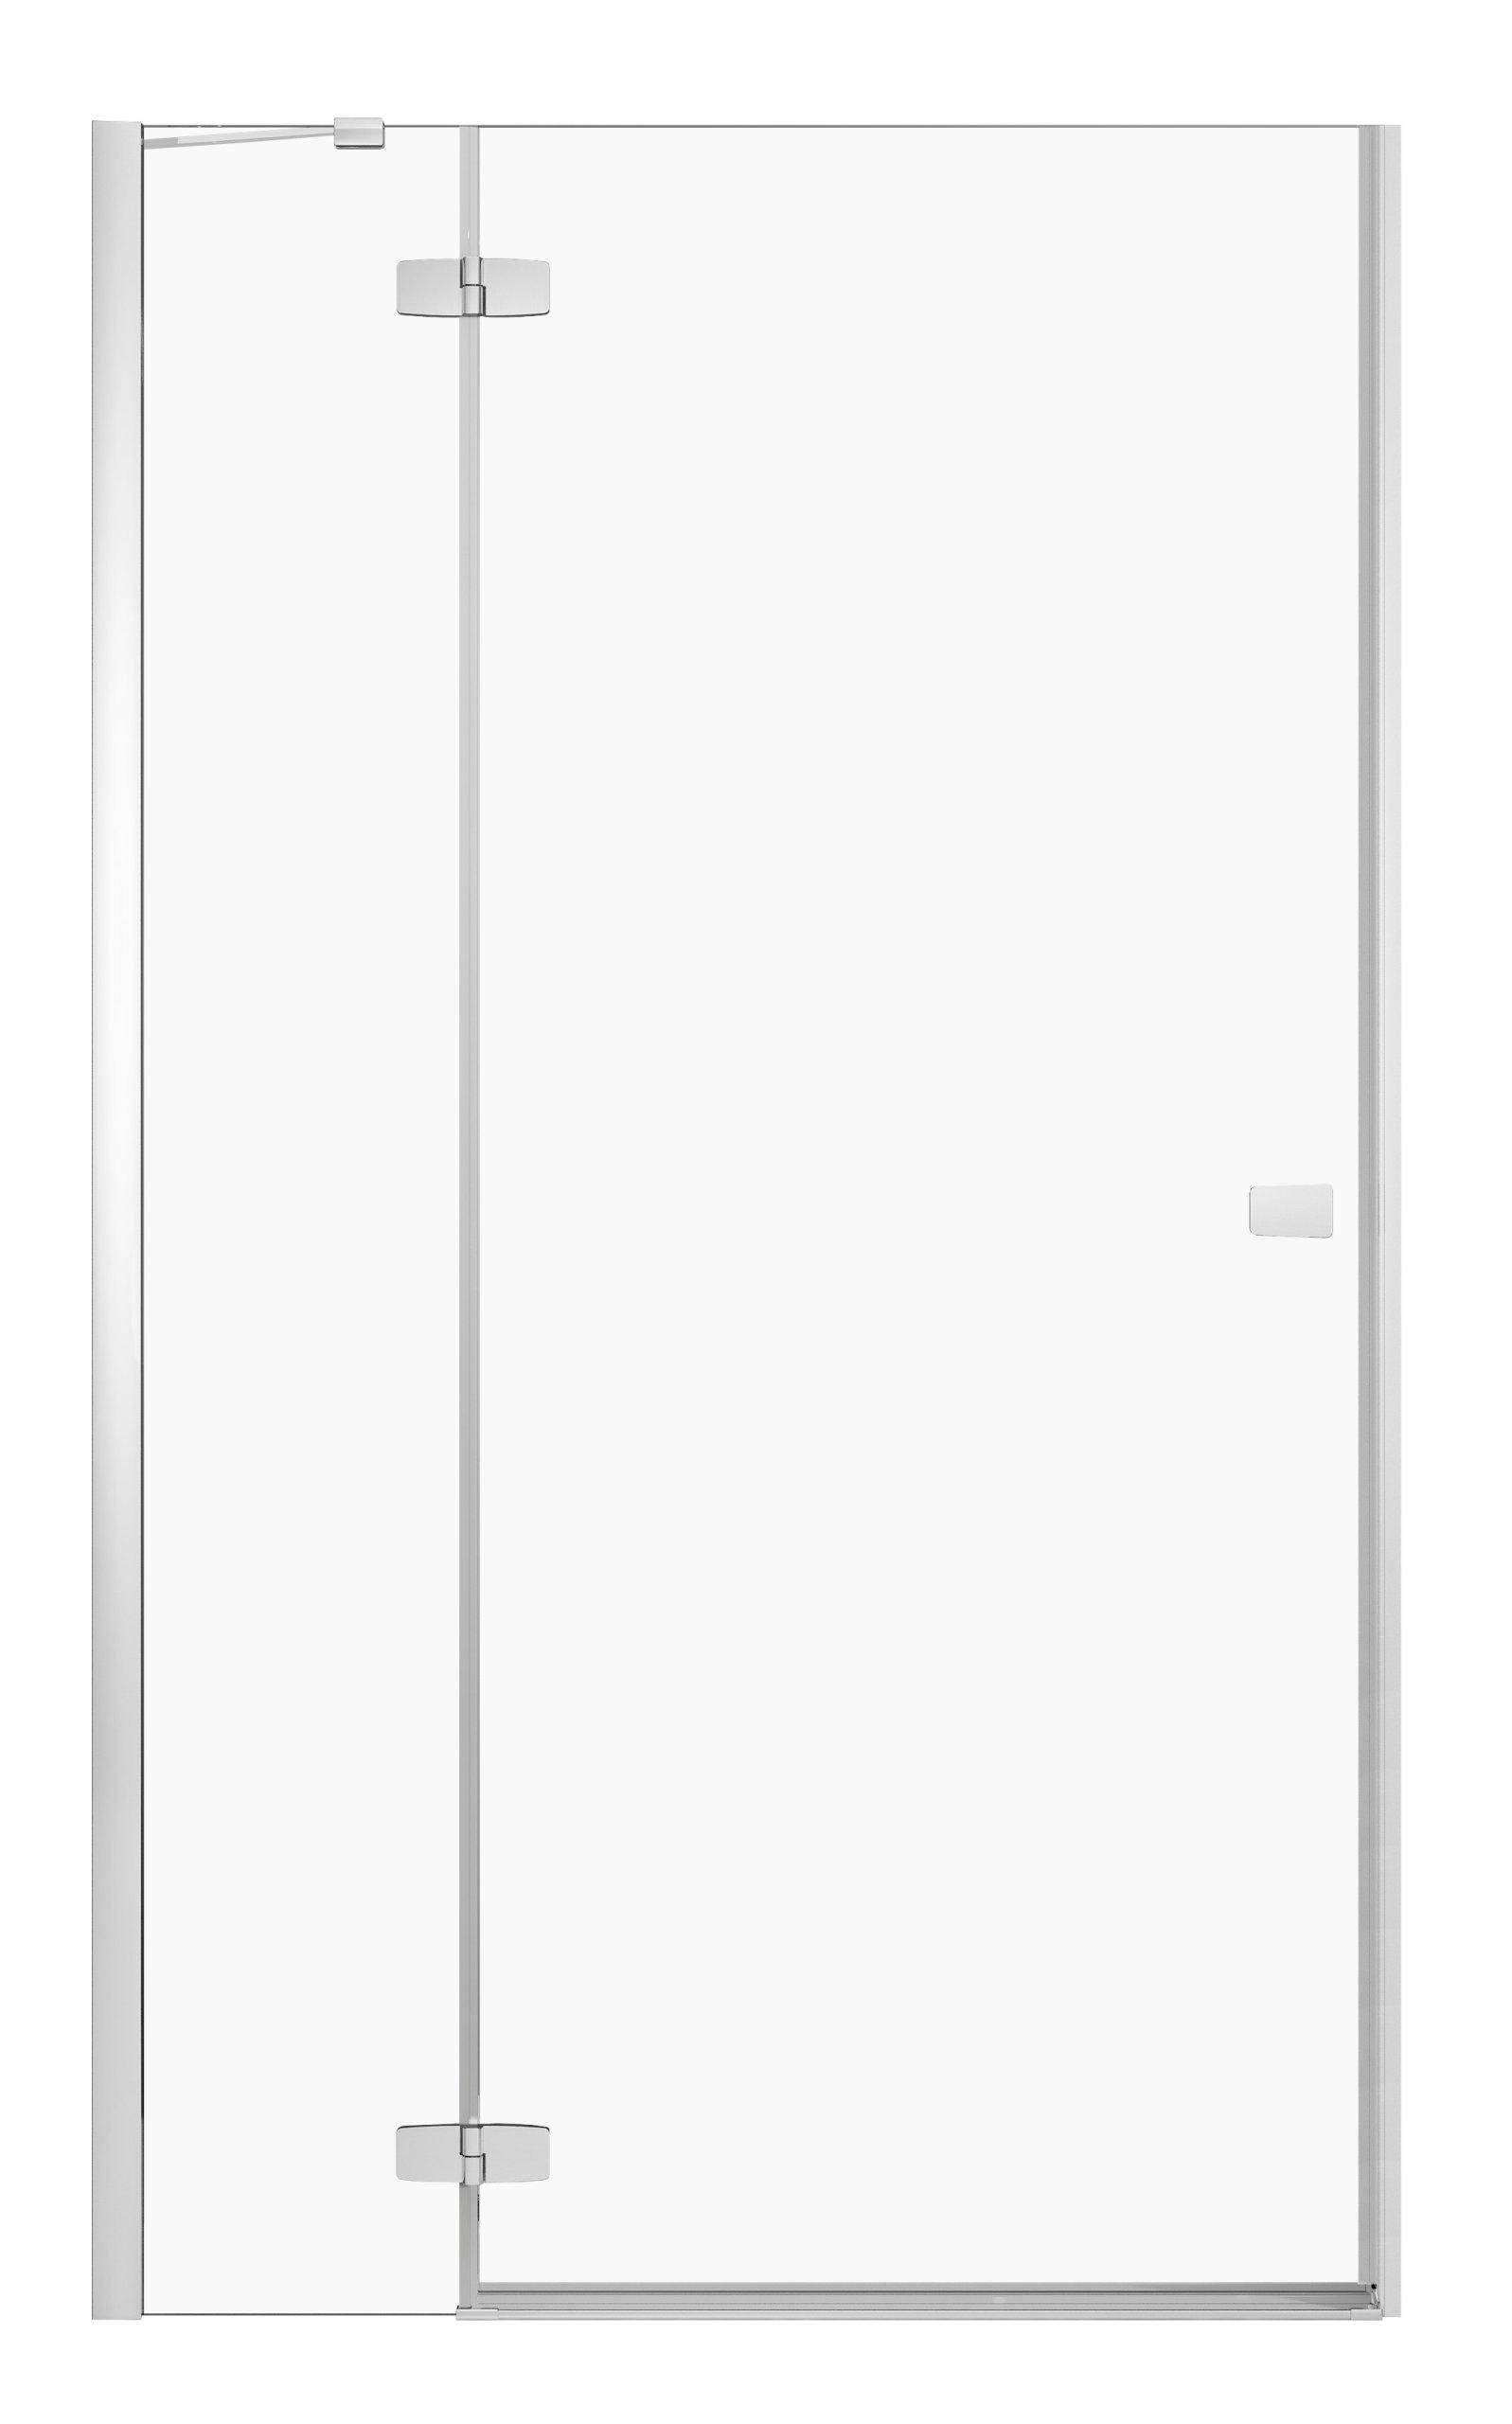 Fuenta Nové sprchové dvere DWJ 90x200 RADAWAY